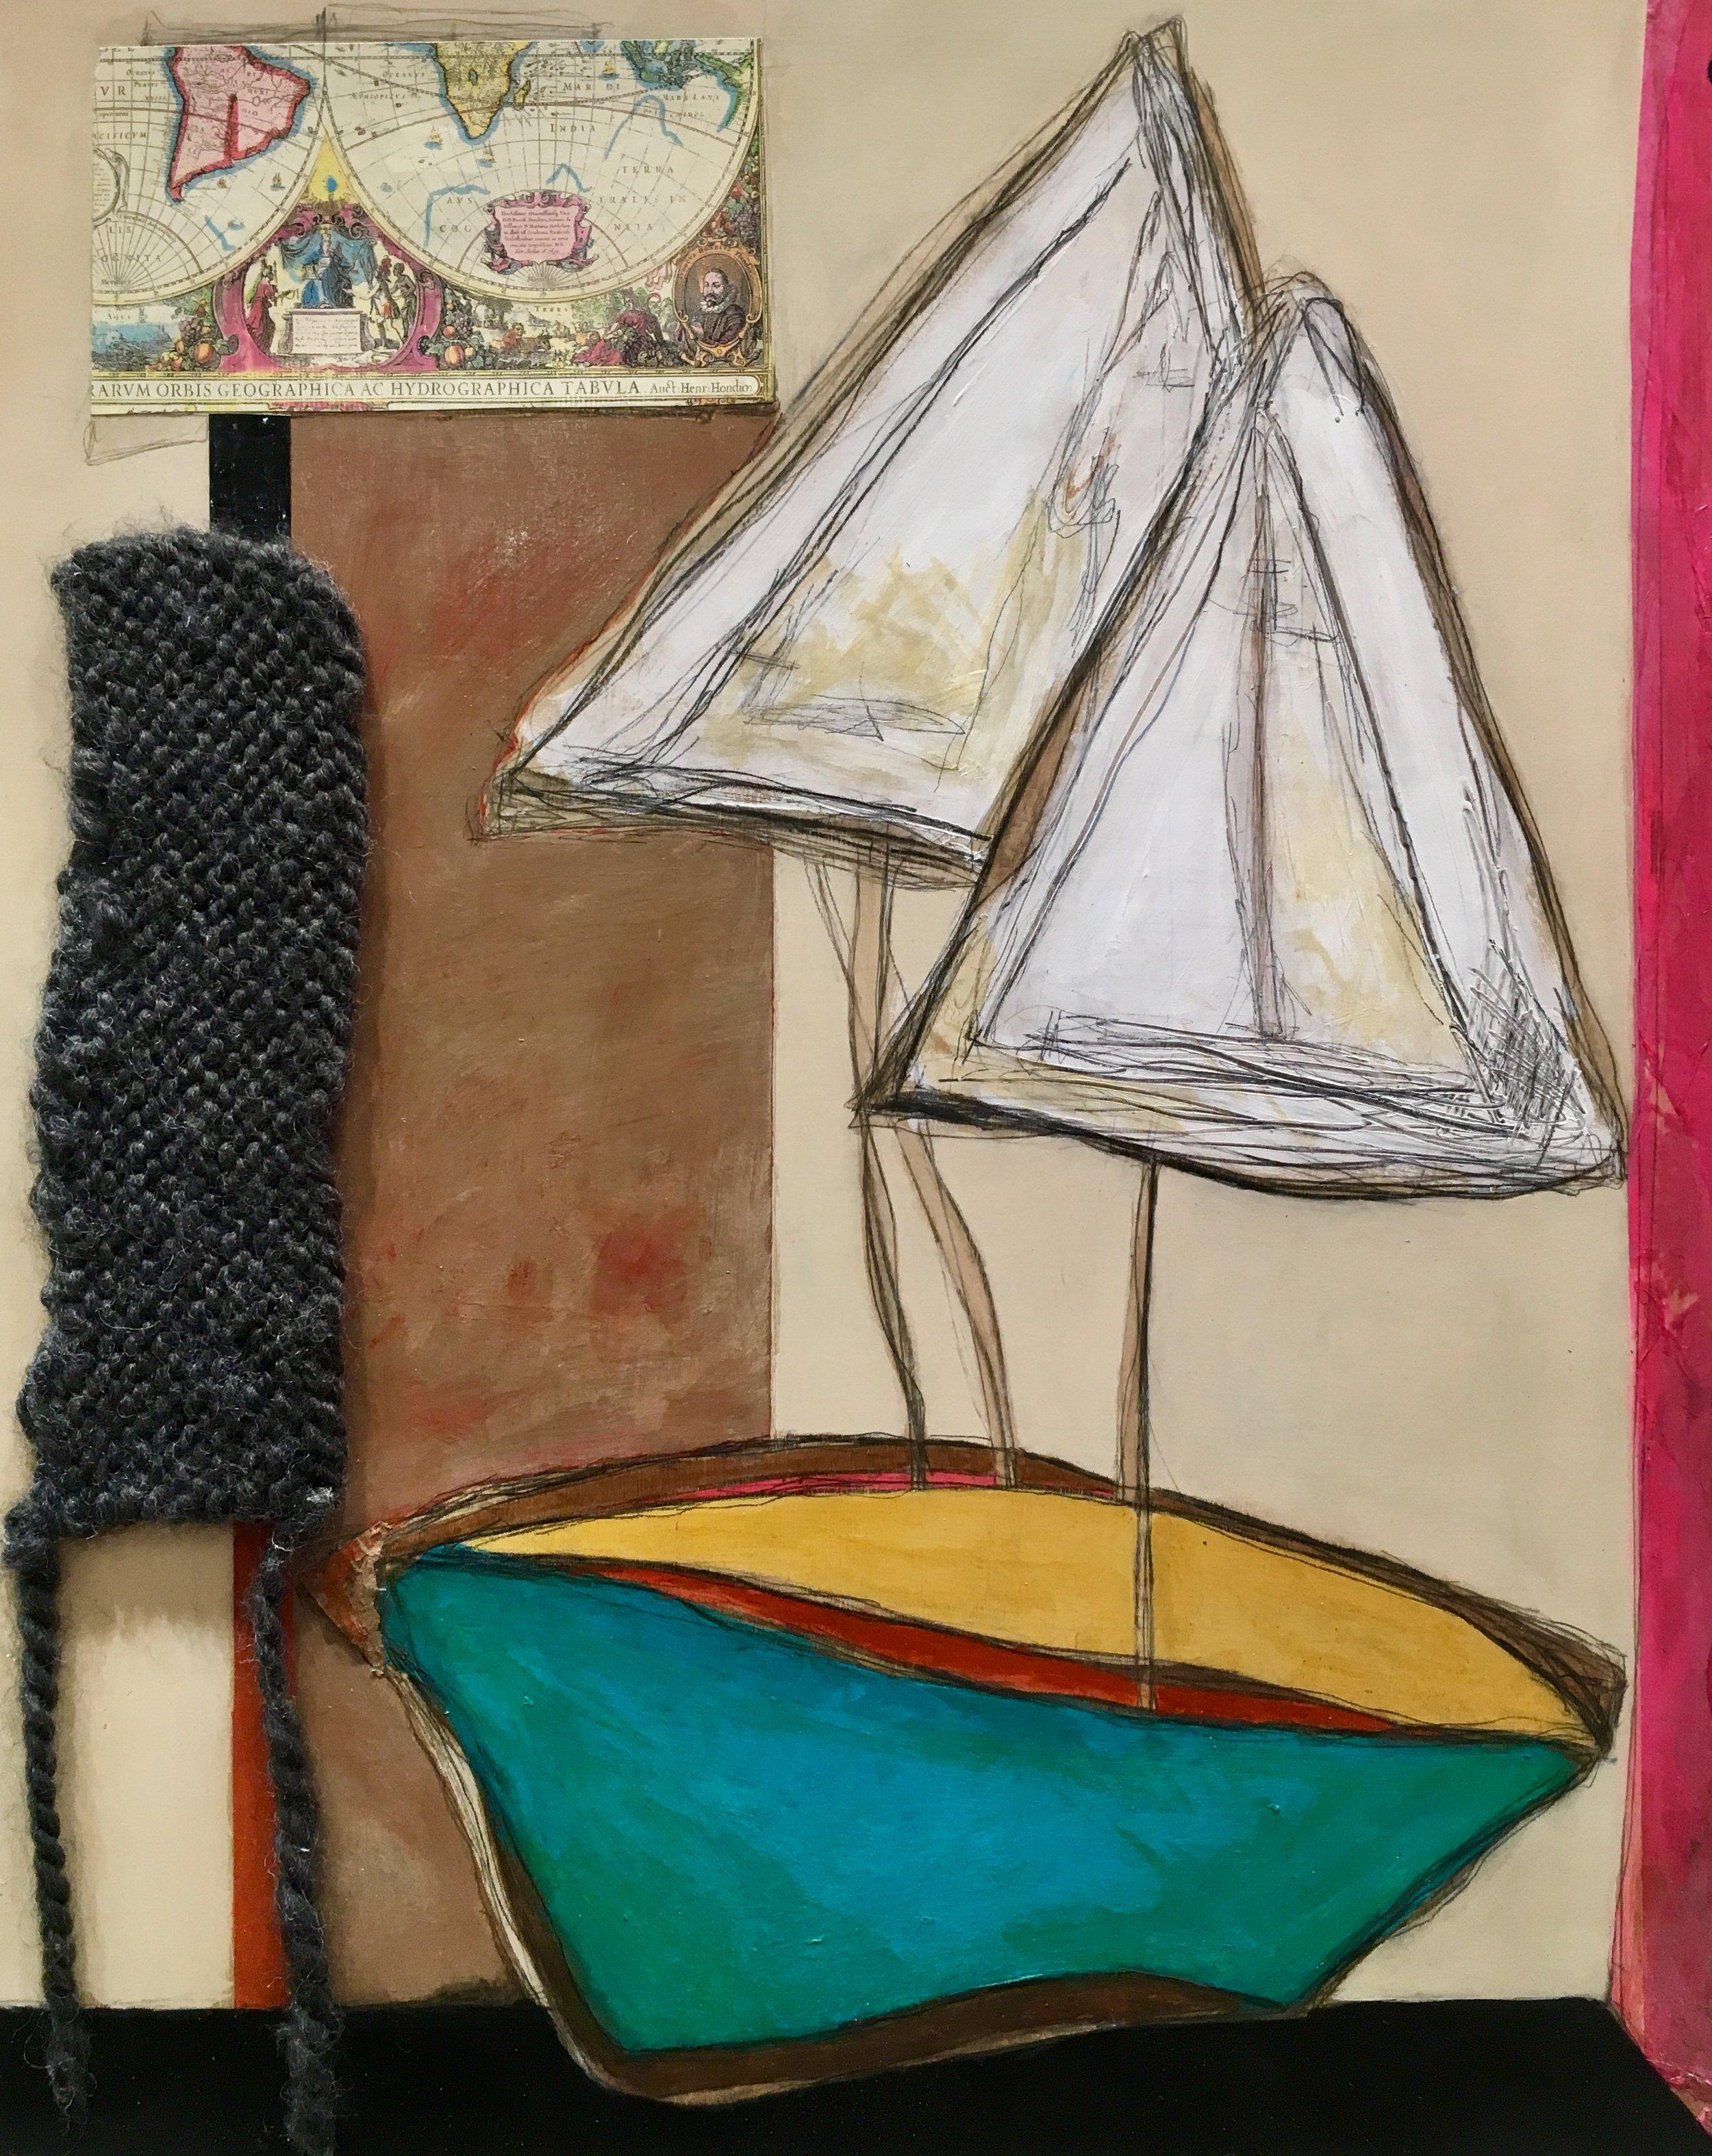 "Casting Nets , acrylic, oil, pencil, pastel, plastic, wallpaper, rice paper, cardboard, tape, tar, shellac, yarn on panel, 20"" x 16"""